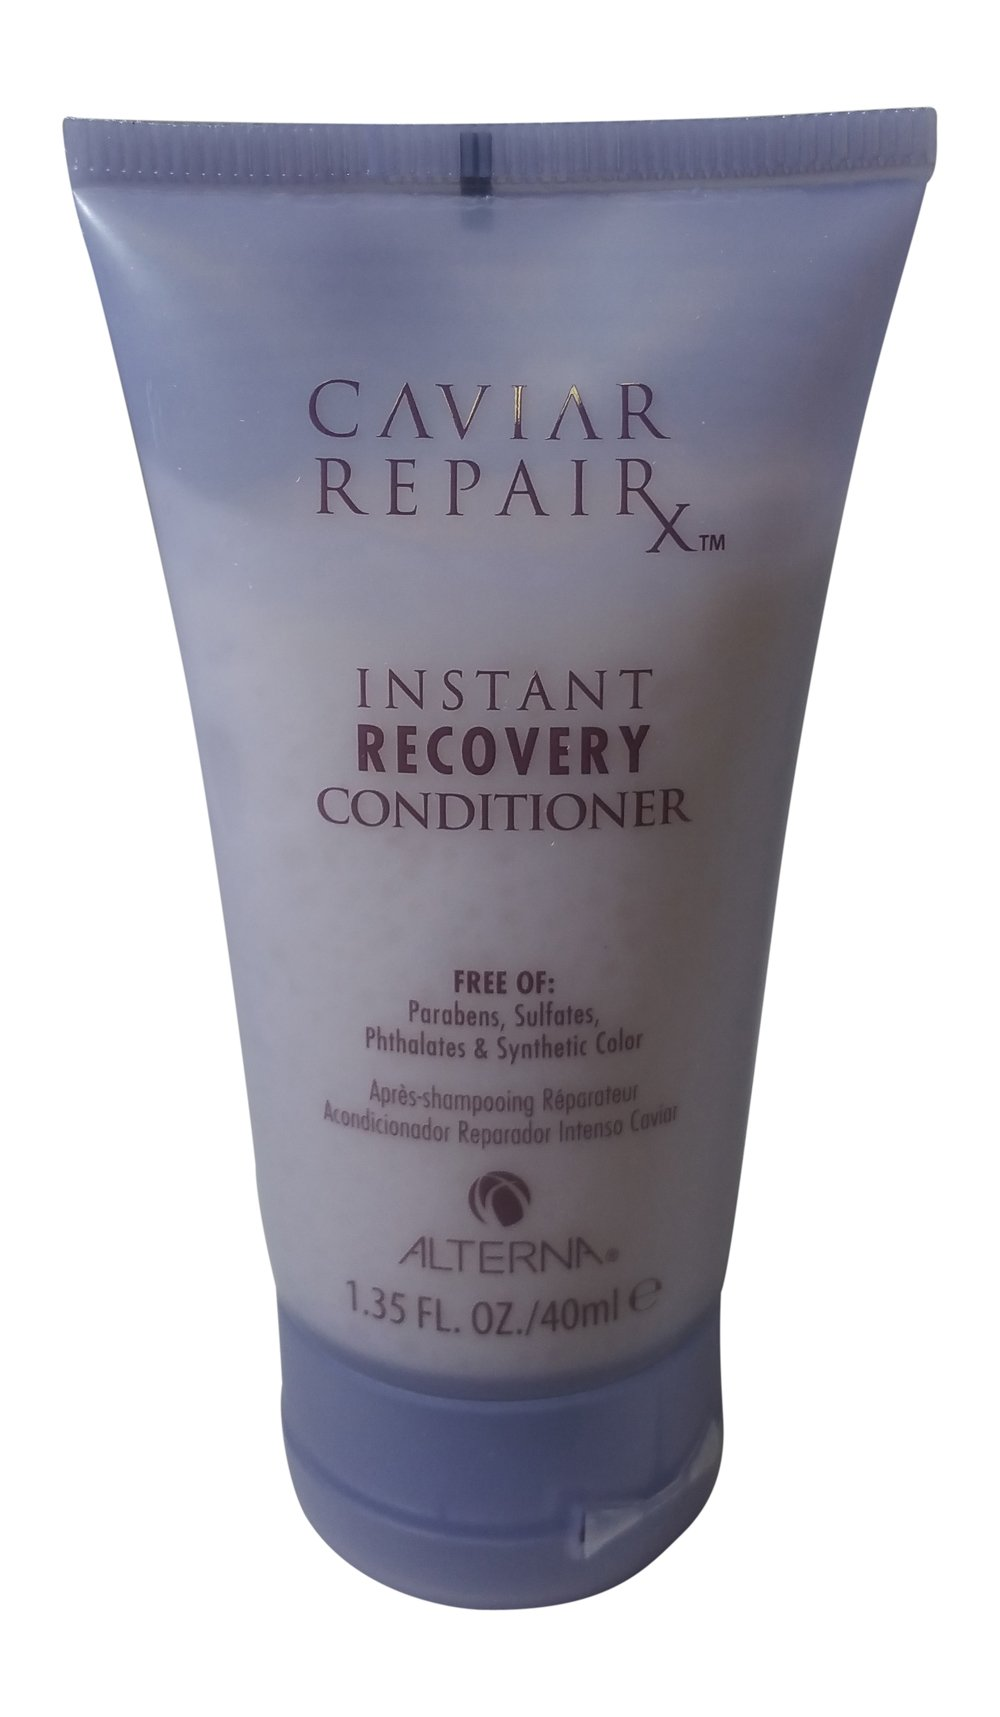 Alterna Caviar Repair Travel Trio: Instant Recovery Shampoo & Conditioner & Re-Texturizing Protein Cream 1.35 oz each by Alterna (Image #3)